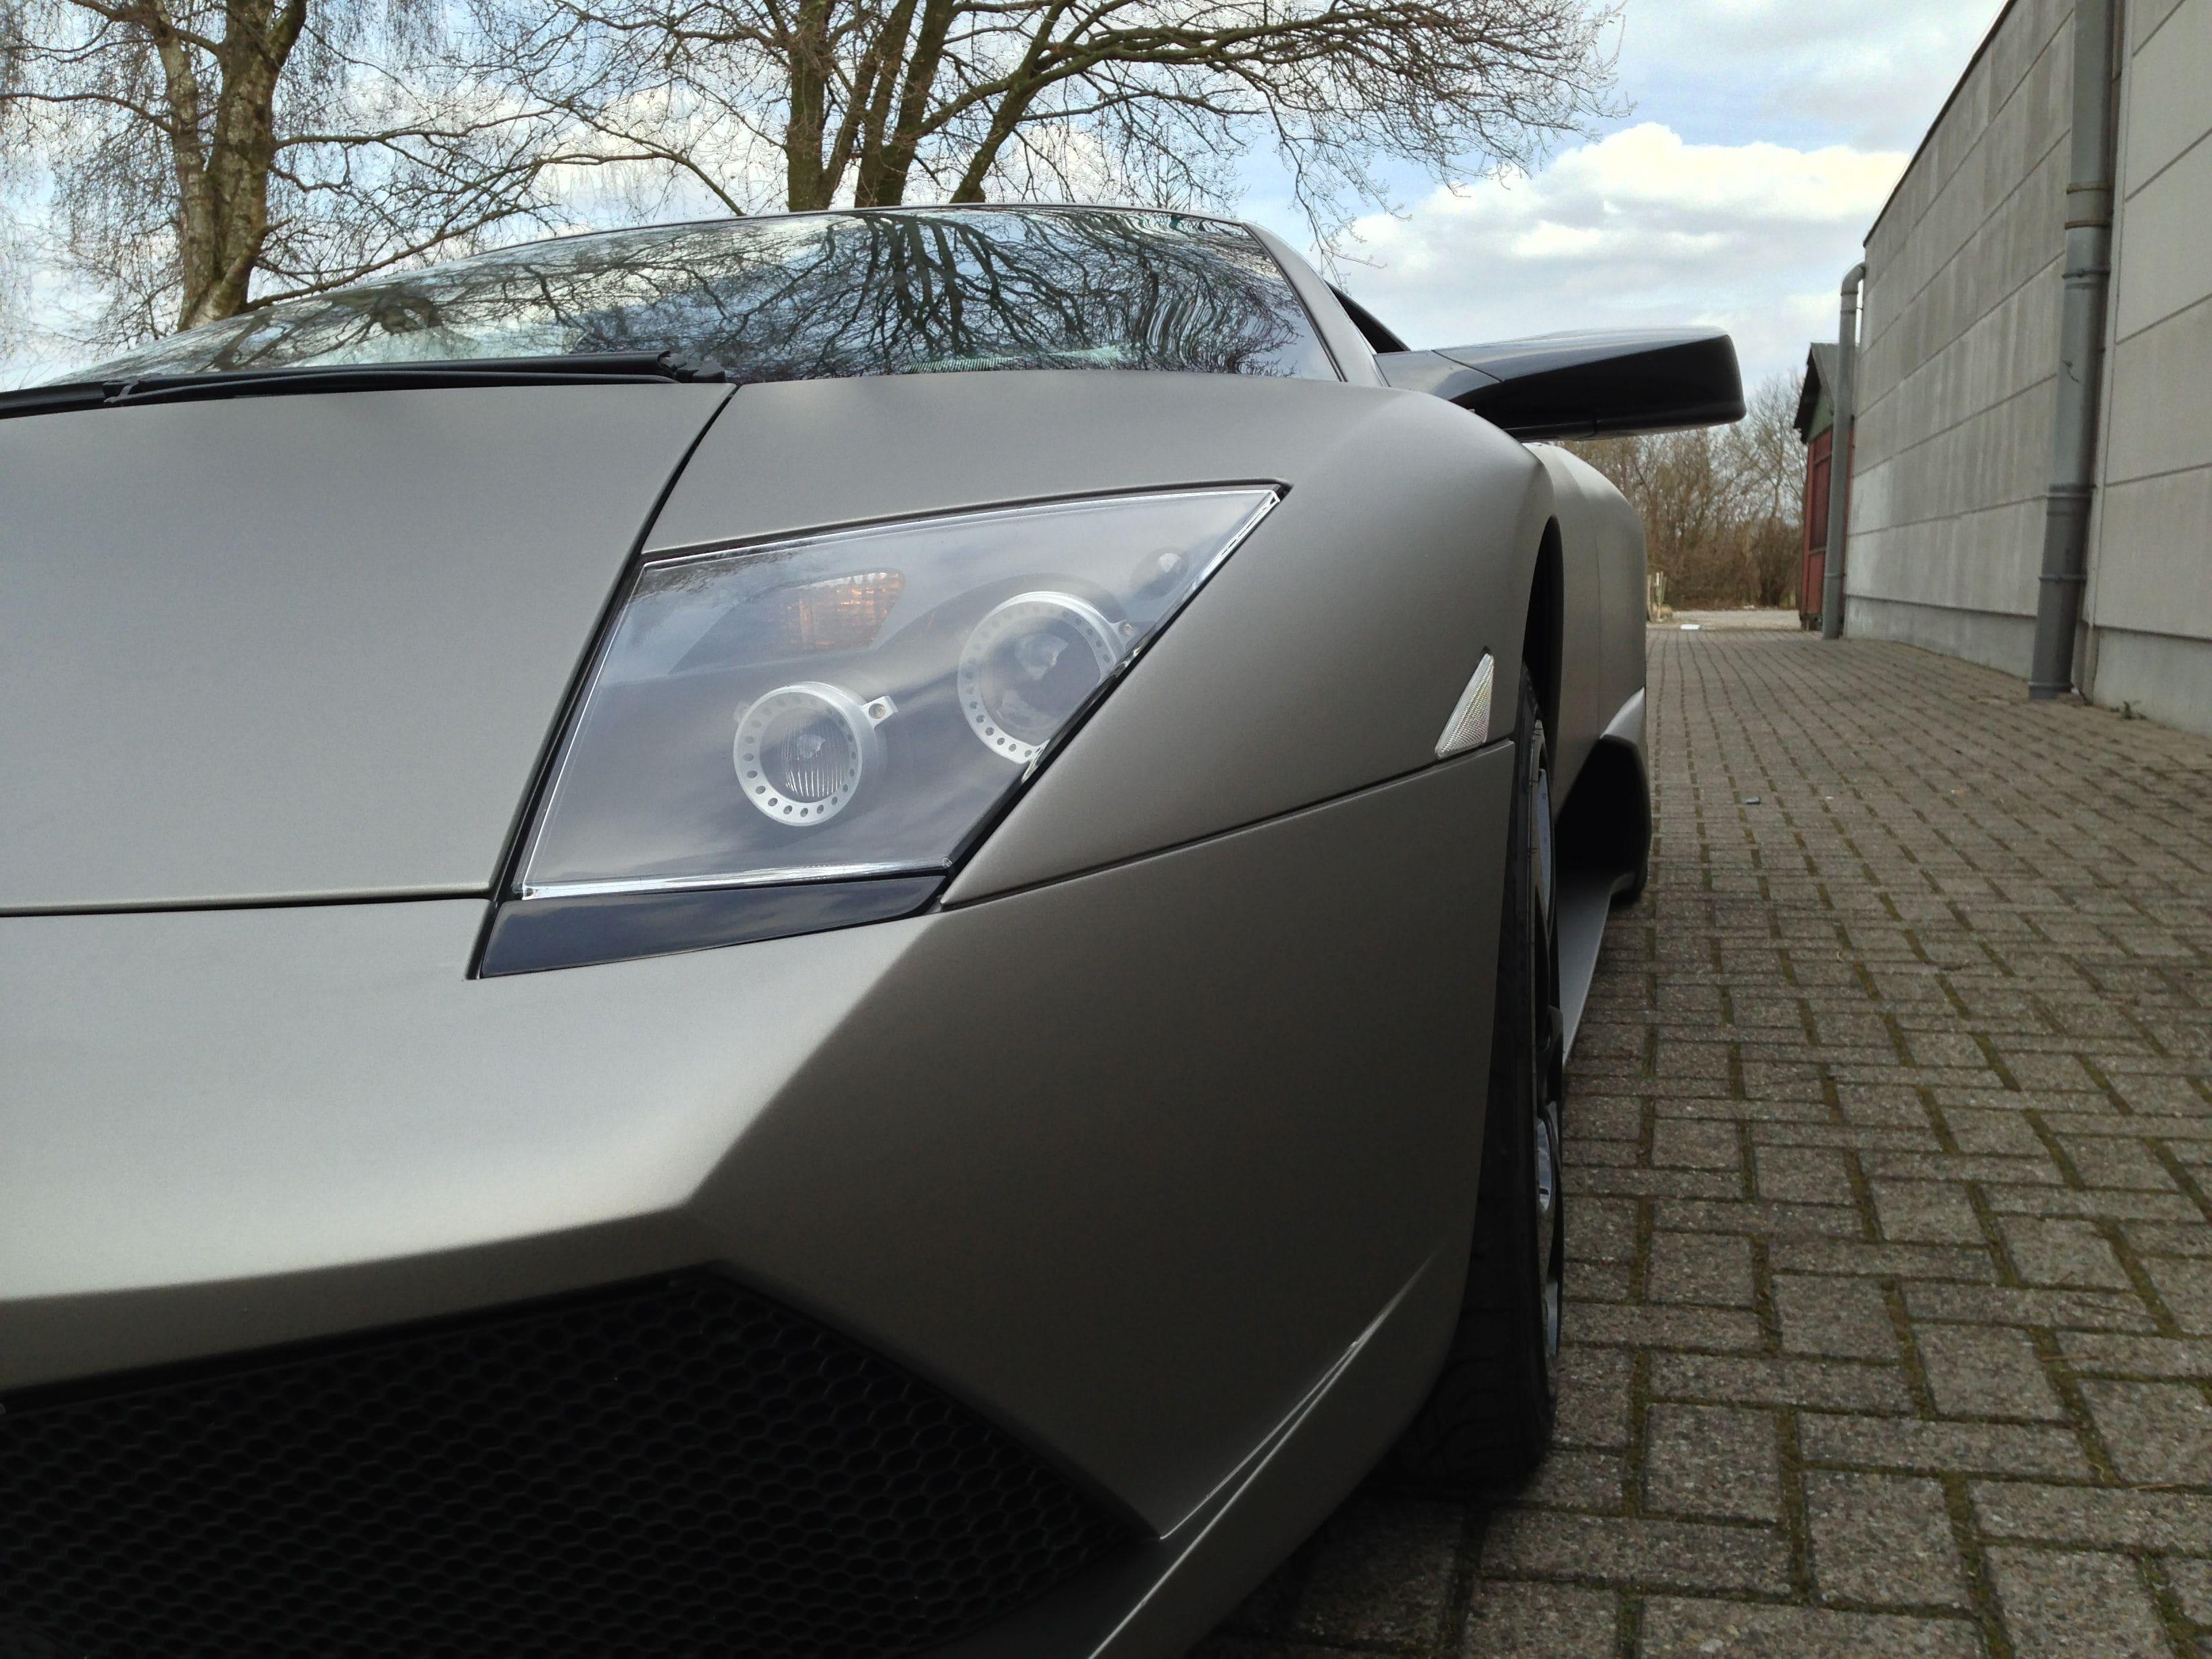 Lamborghini Murcialago LP670 met Gunpowder Wrap, Carwrapping door Wrapmyride.nu Foto-nr:5977, ©2021